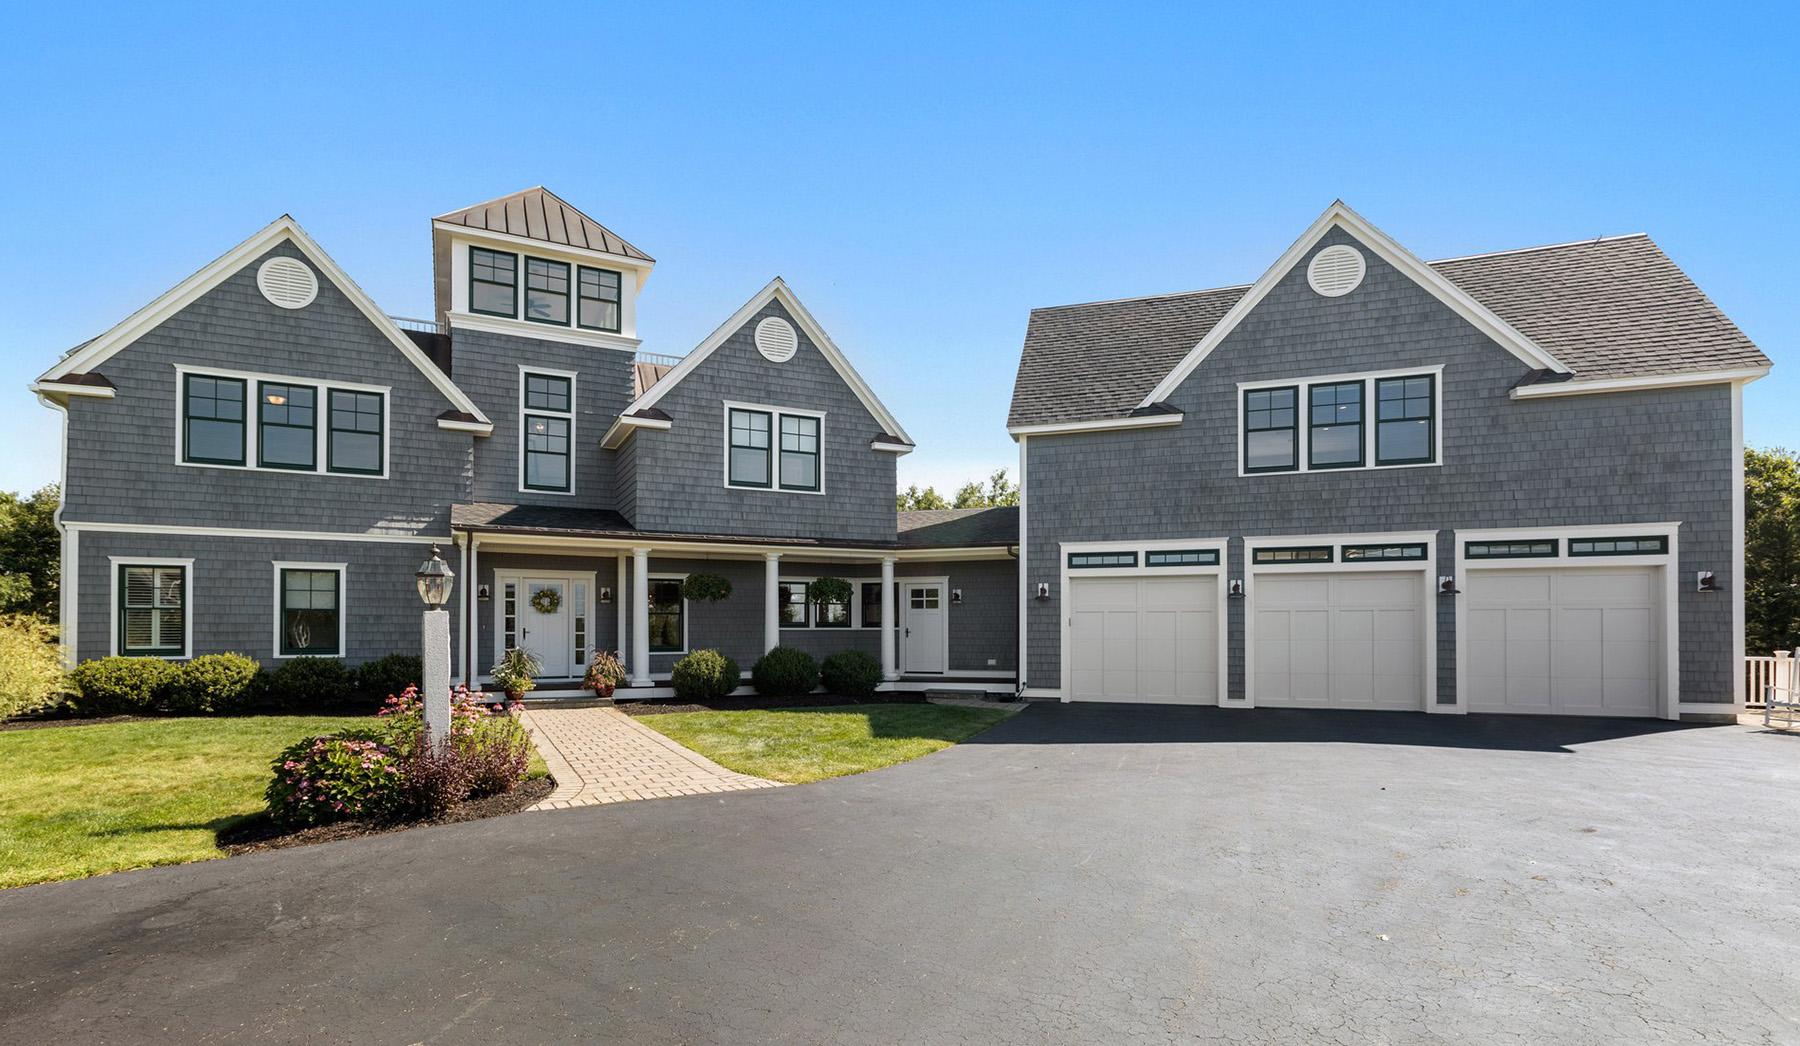 Gray cedar shake siding with white trim & black windows.